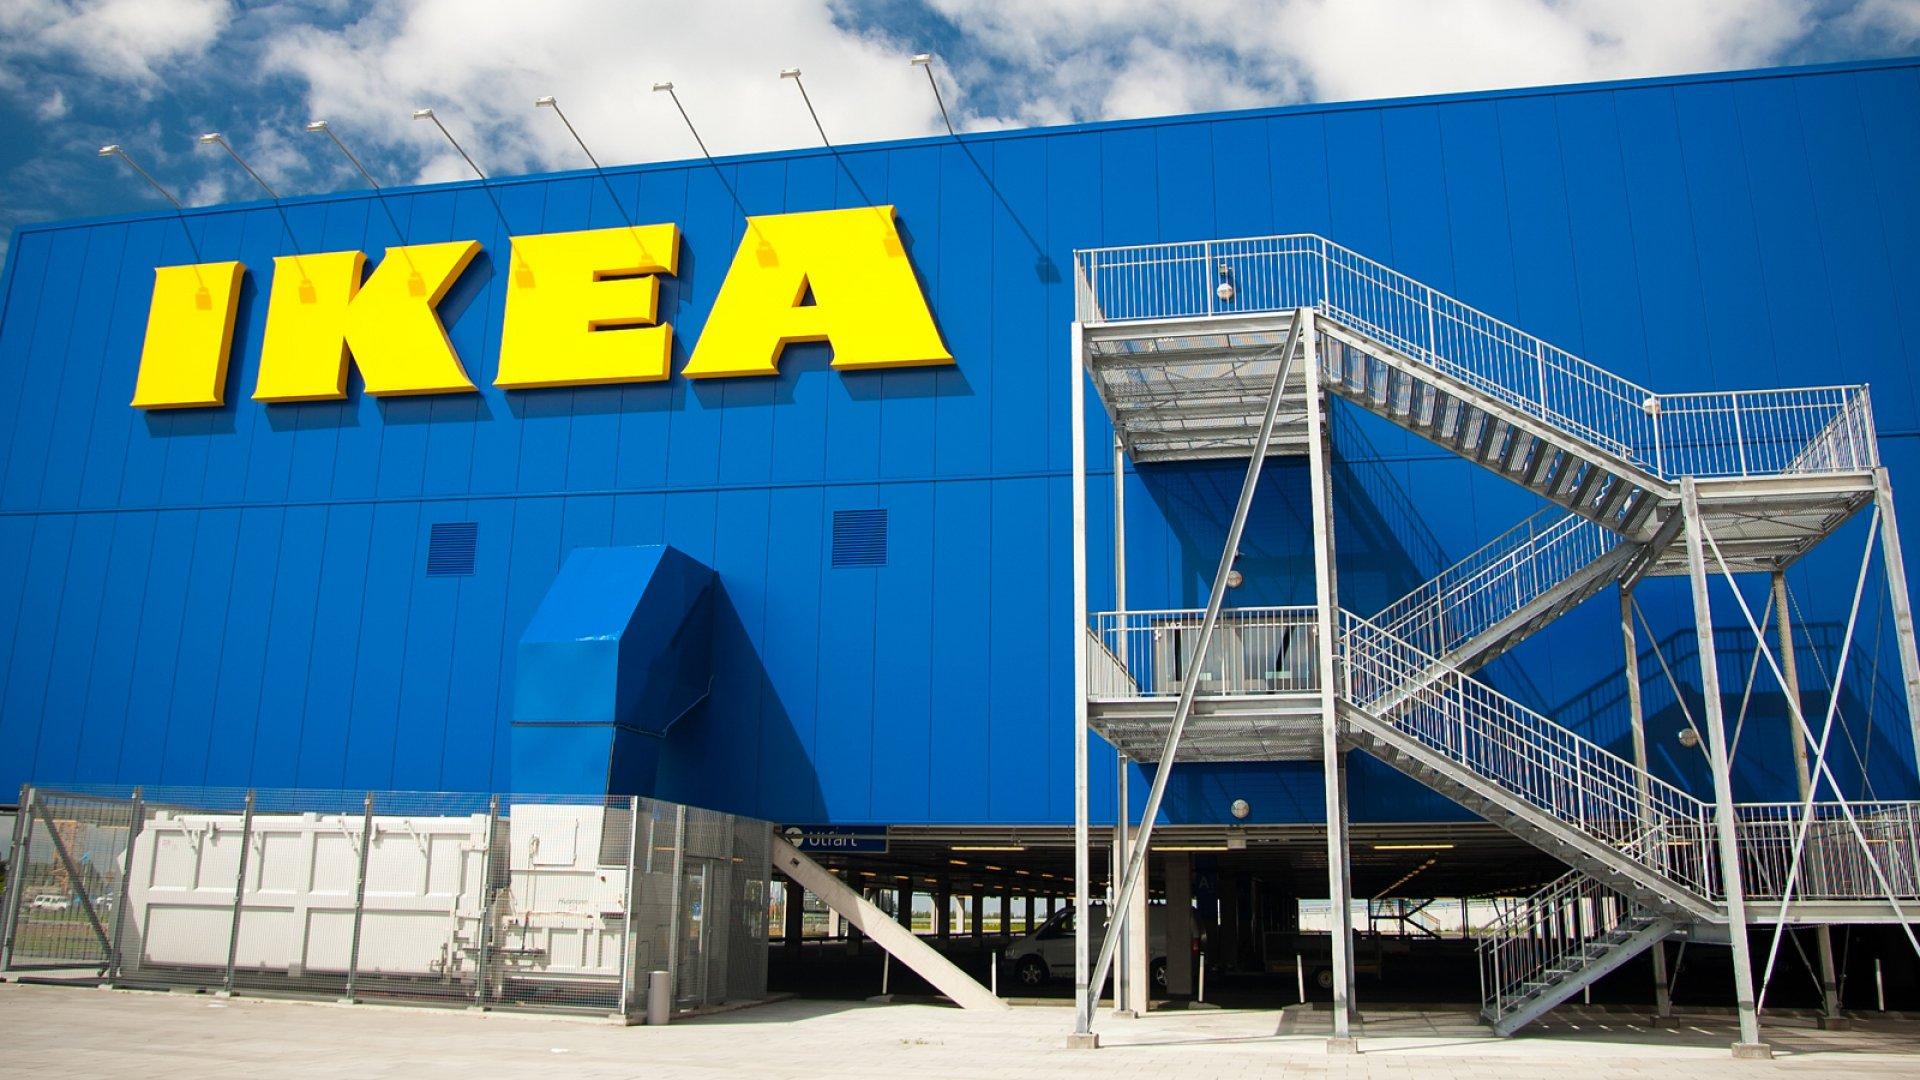 The Design Secrets That Turned IKEA Into a Furniture Heavyweight